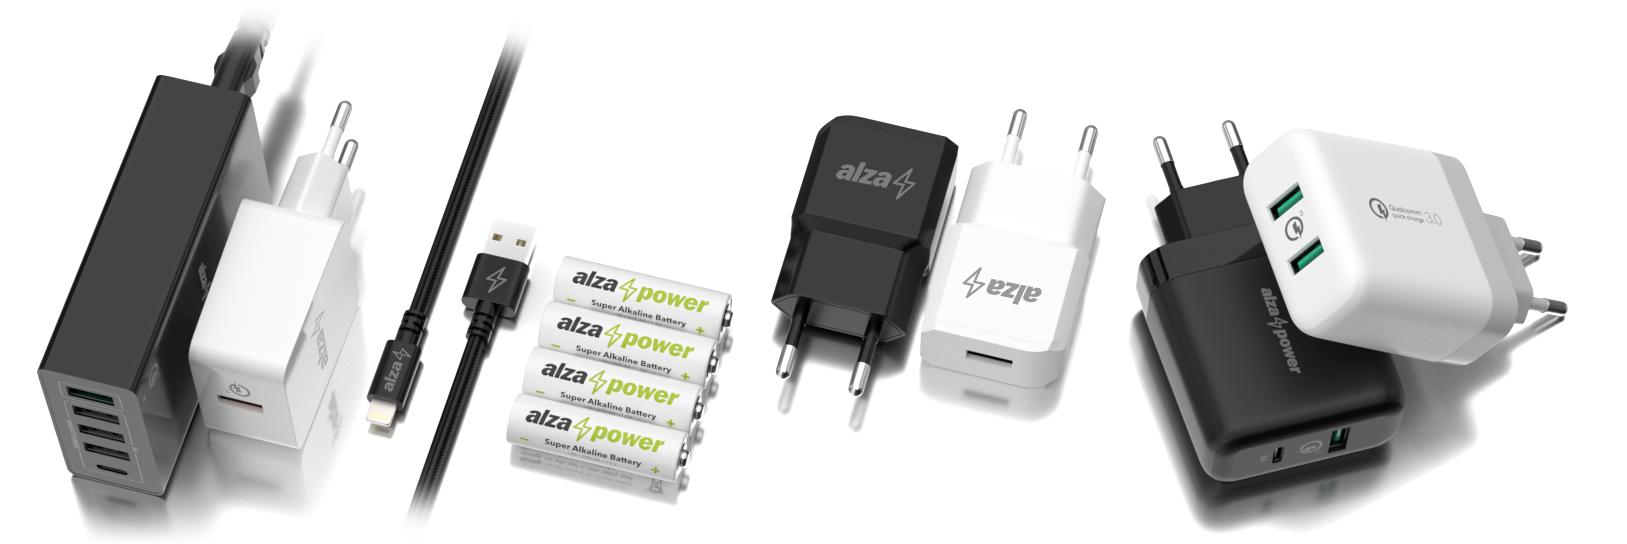 ee5e5c529 AlzaPower Q200 Quick Charge 3.0 Black - Nabíječka | Alza.cz